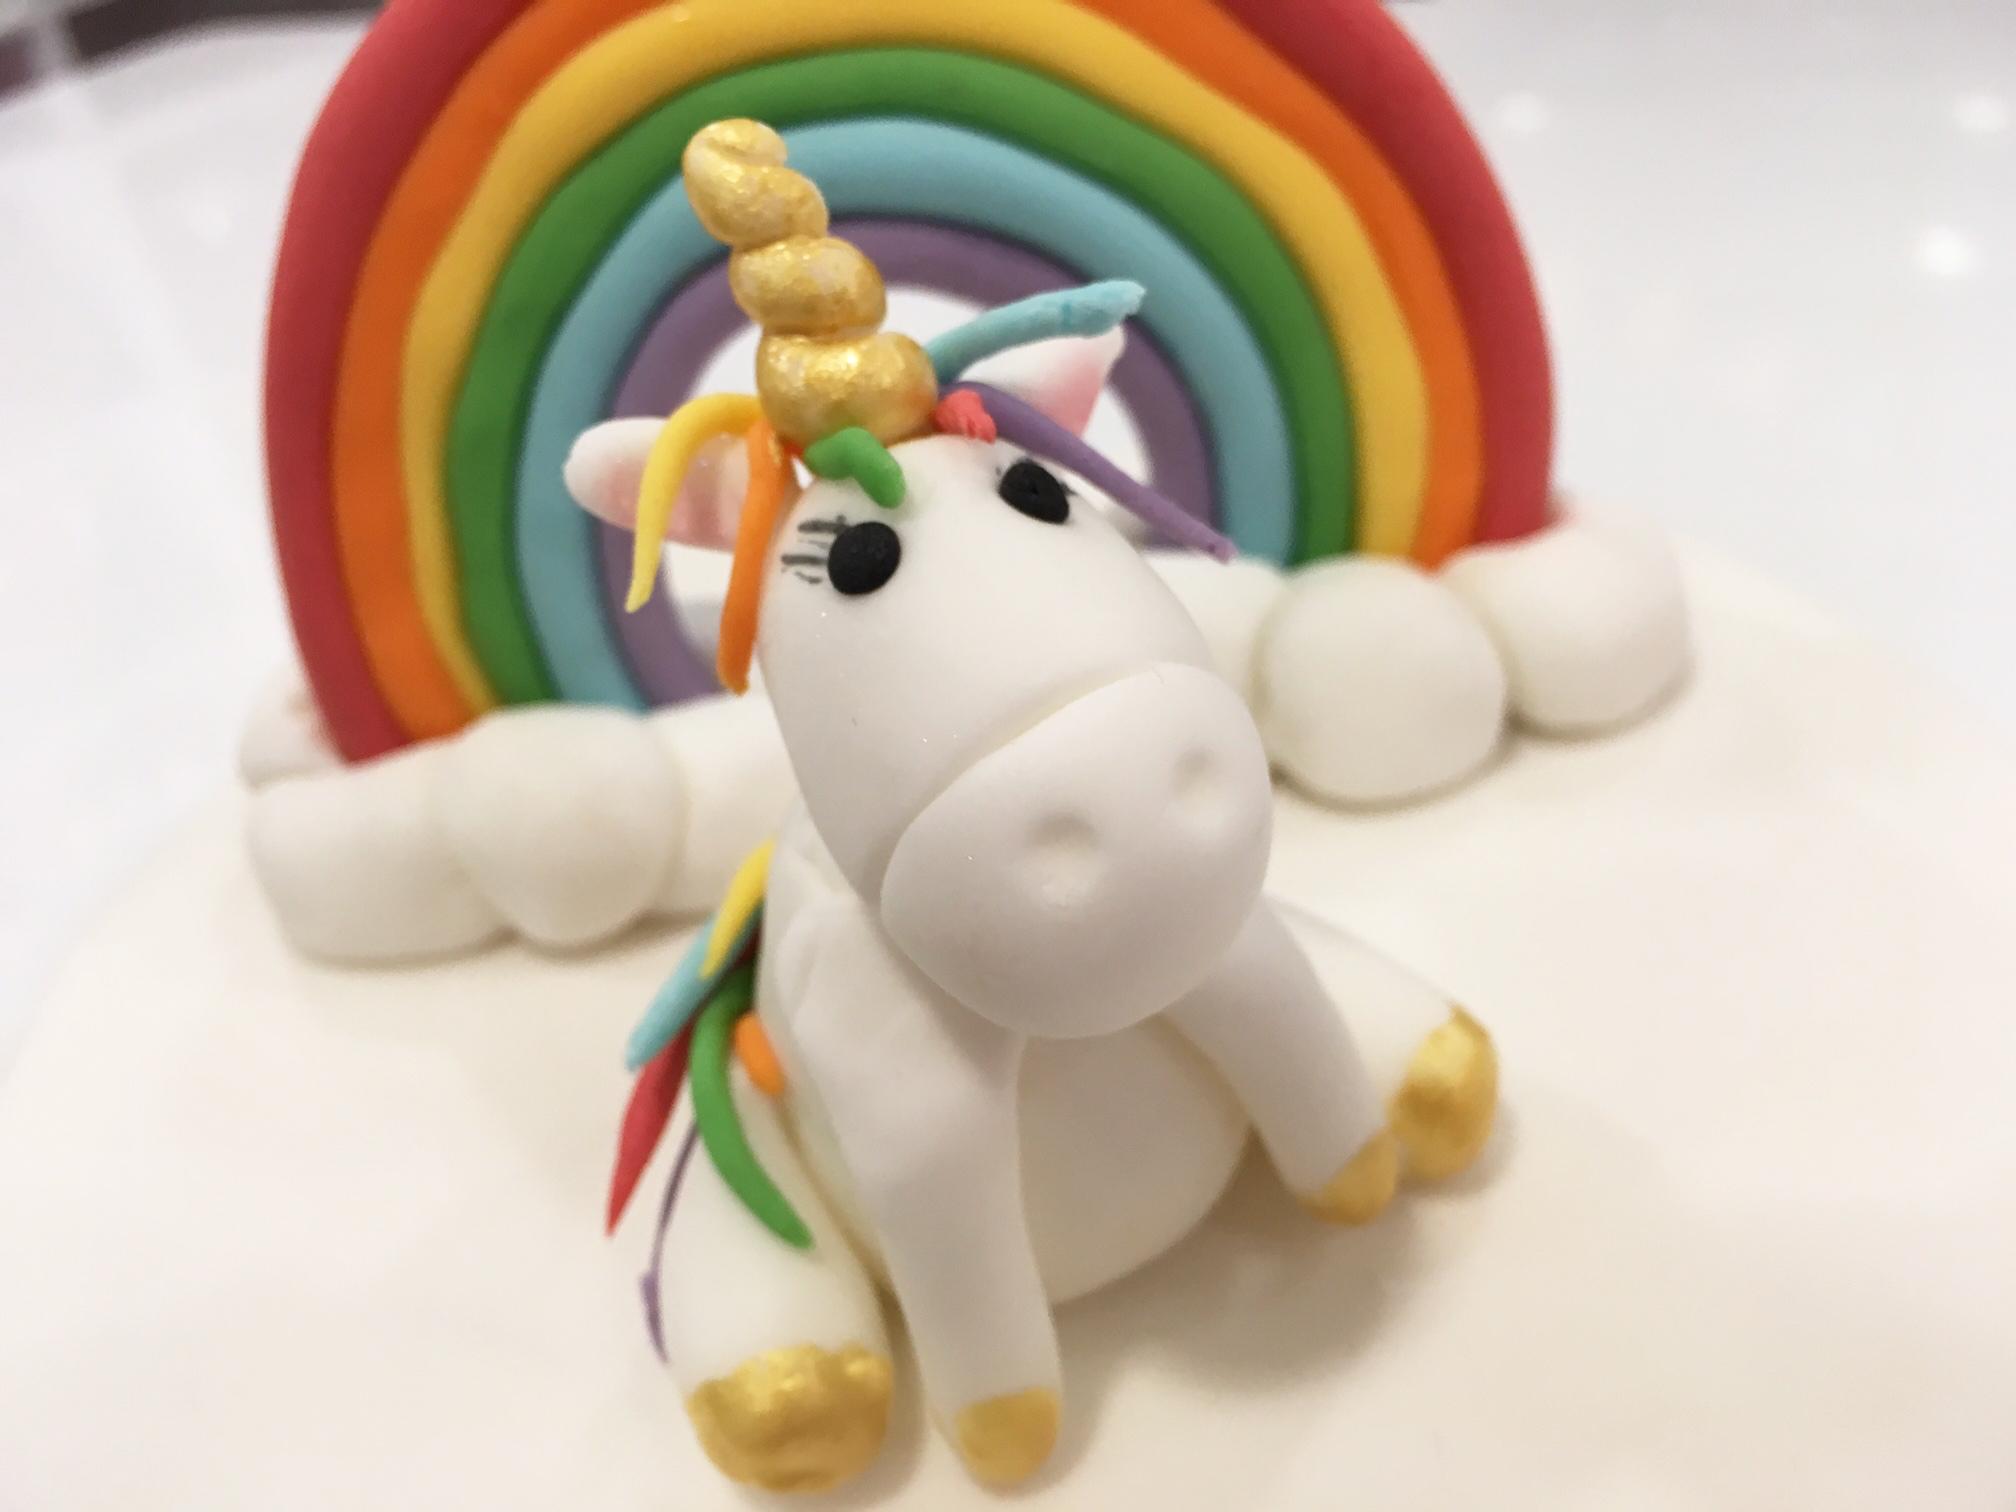 UnicornRainbowCake